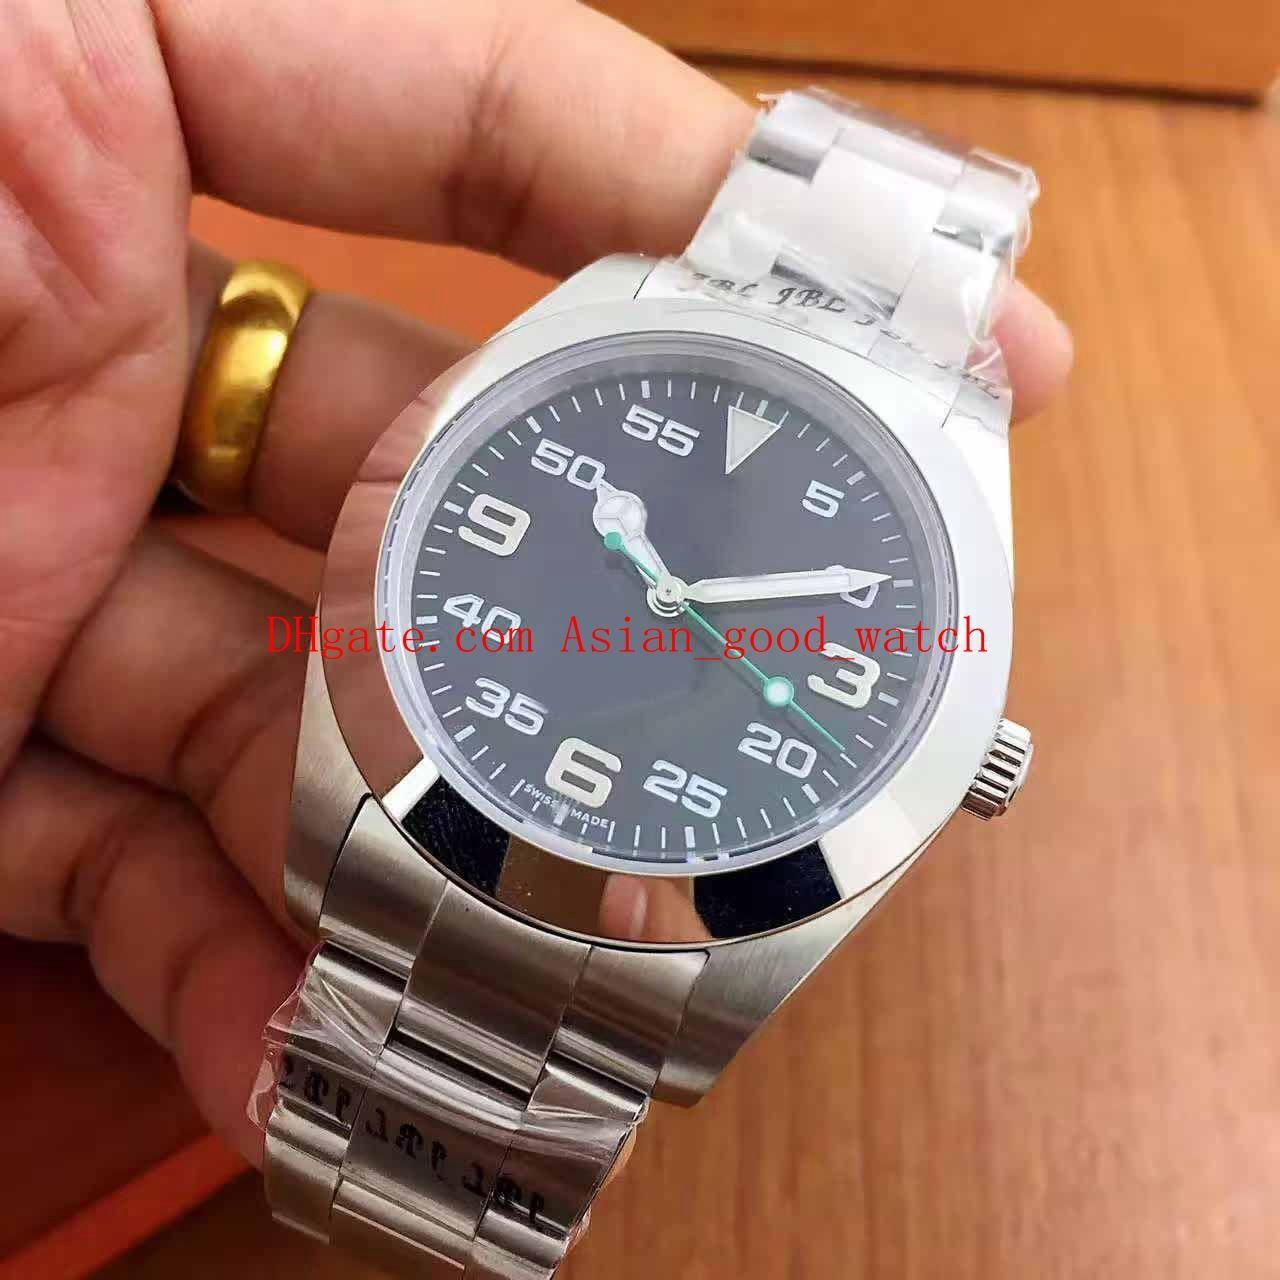 Envío gratis Serie Classic Hombres Reloj High High 40mm 116900 Asia 2813 Fecha de movimiento Pulsera de acero inoxidable Relojes de relojes para hombre